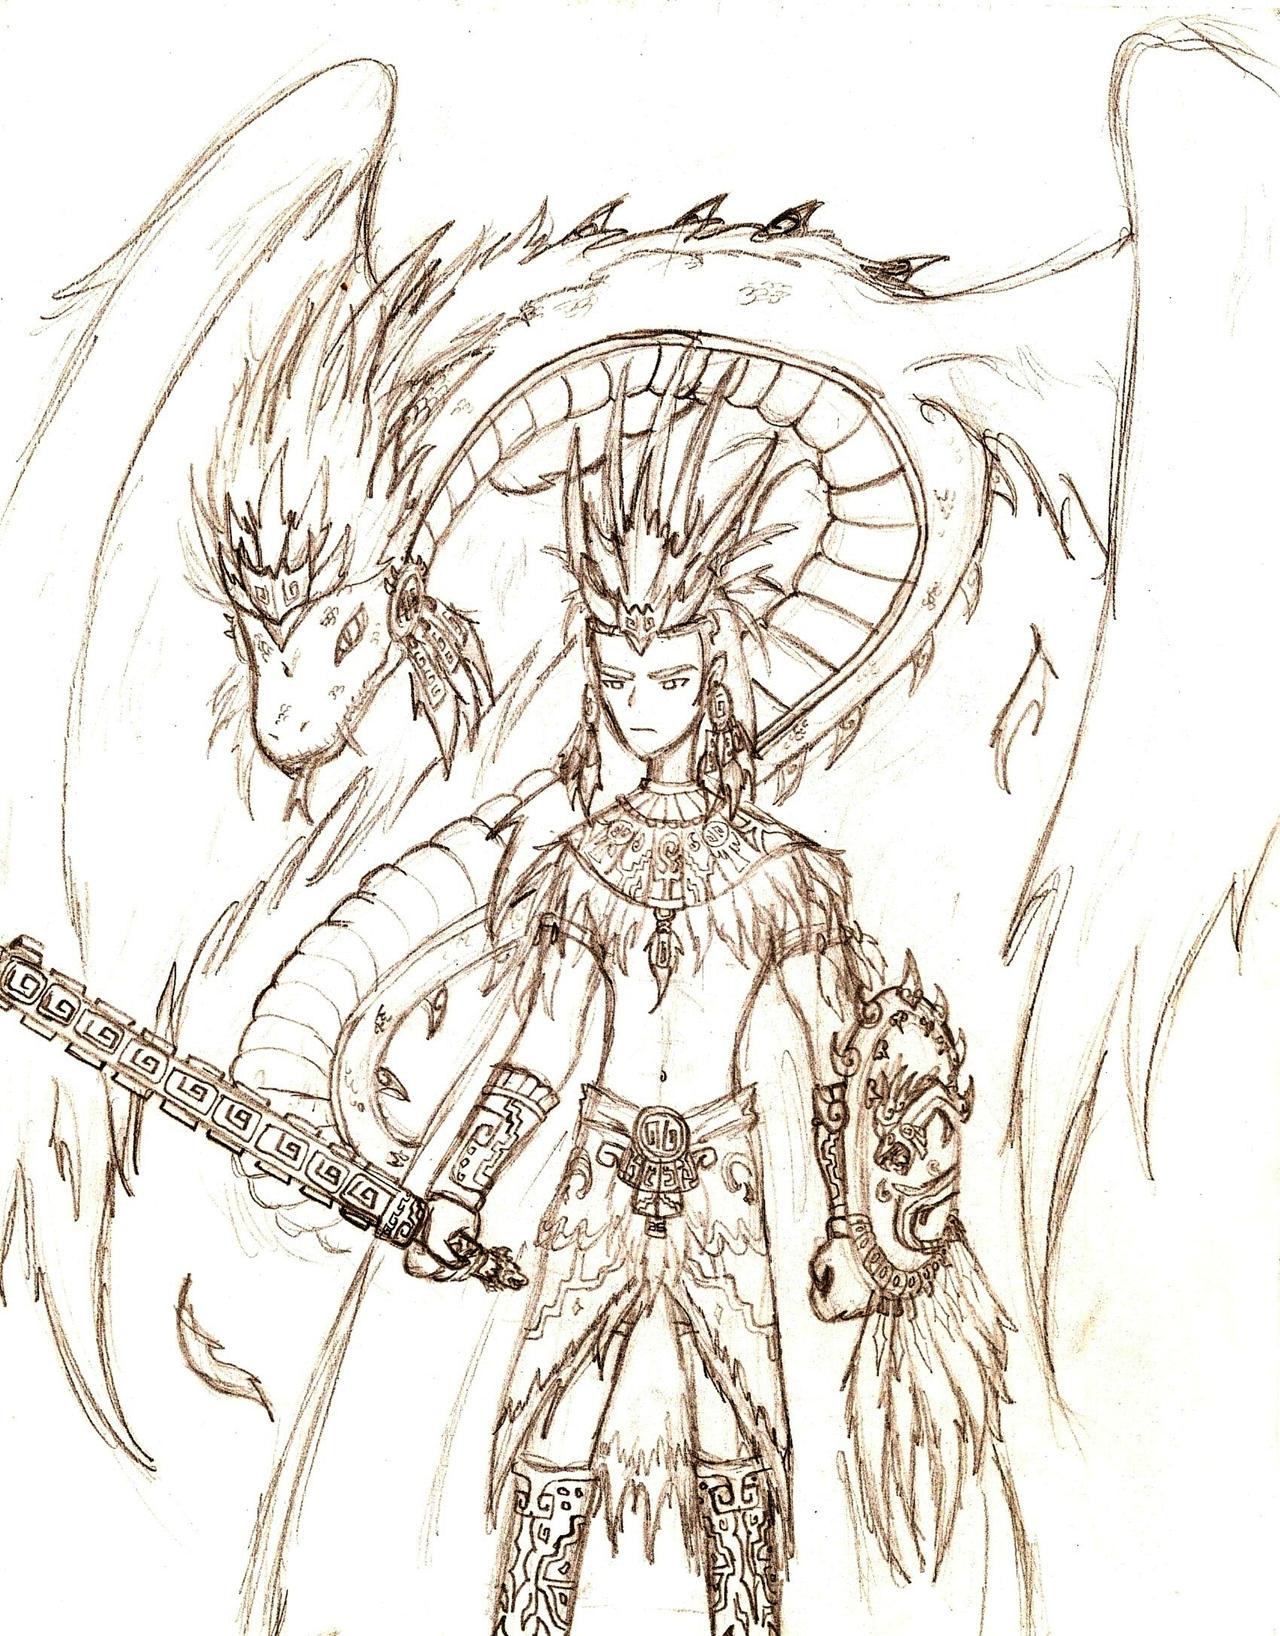 Aztec warrior of Quetzalcoatl by invader-phoebe on DeviantArt